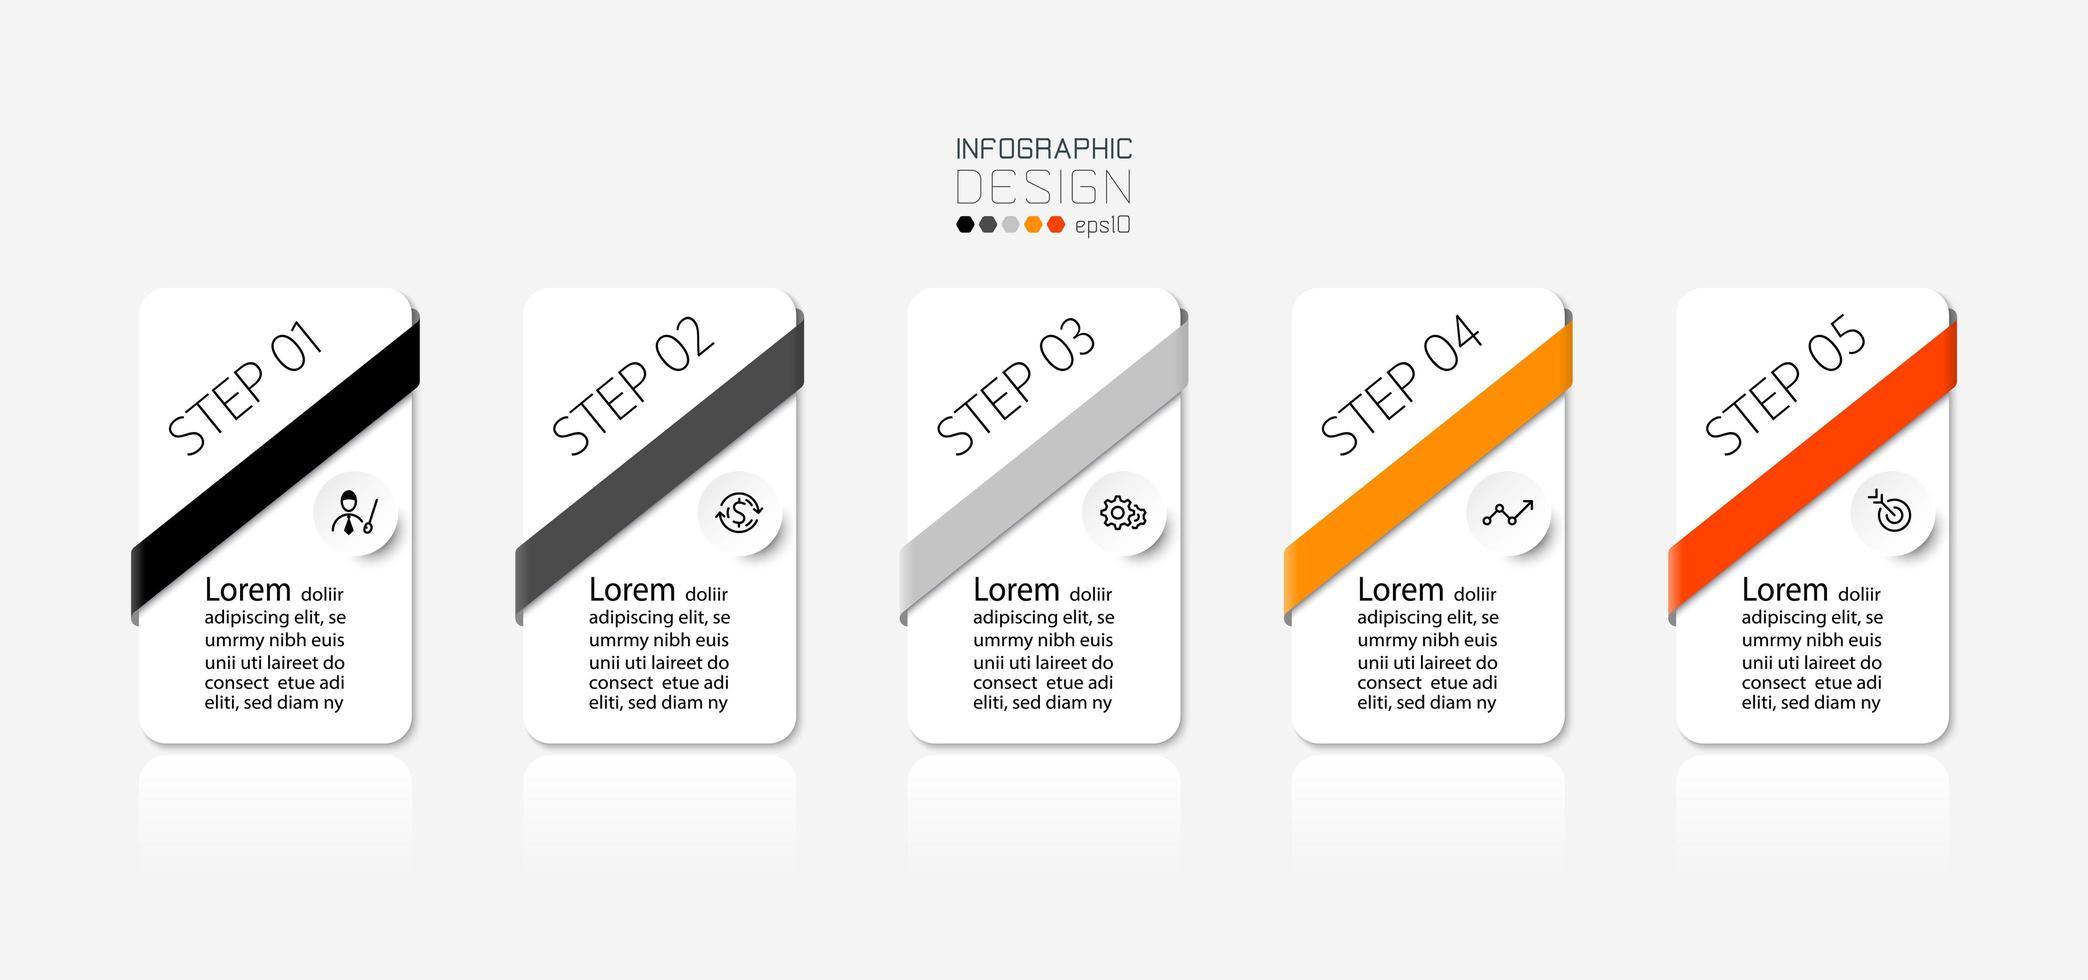 5 etapas do conjunto de design retangular vetor